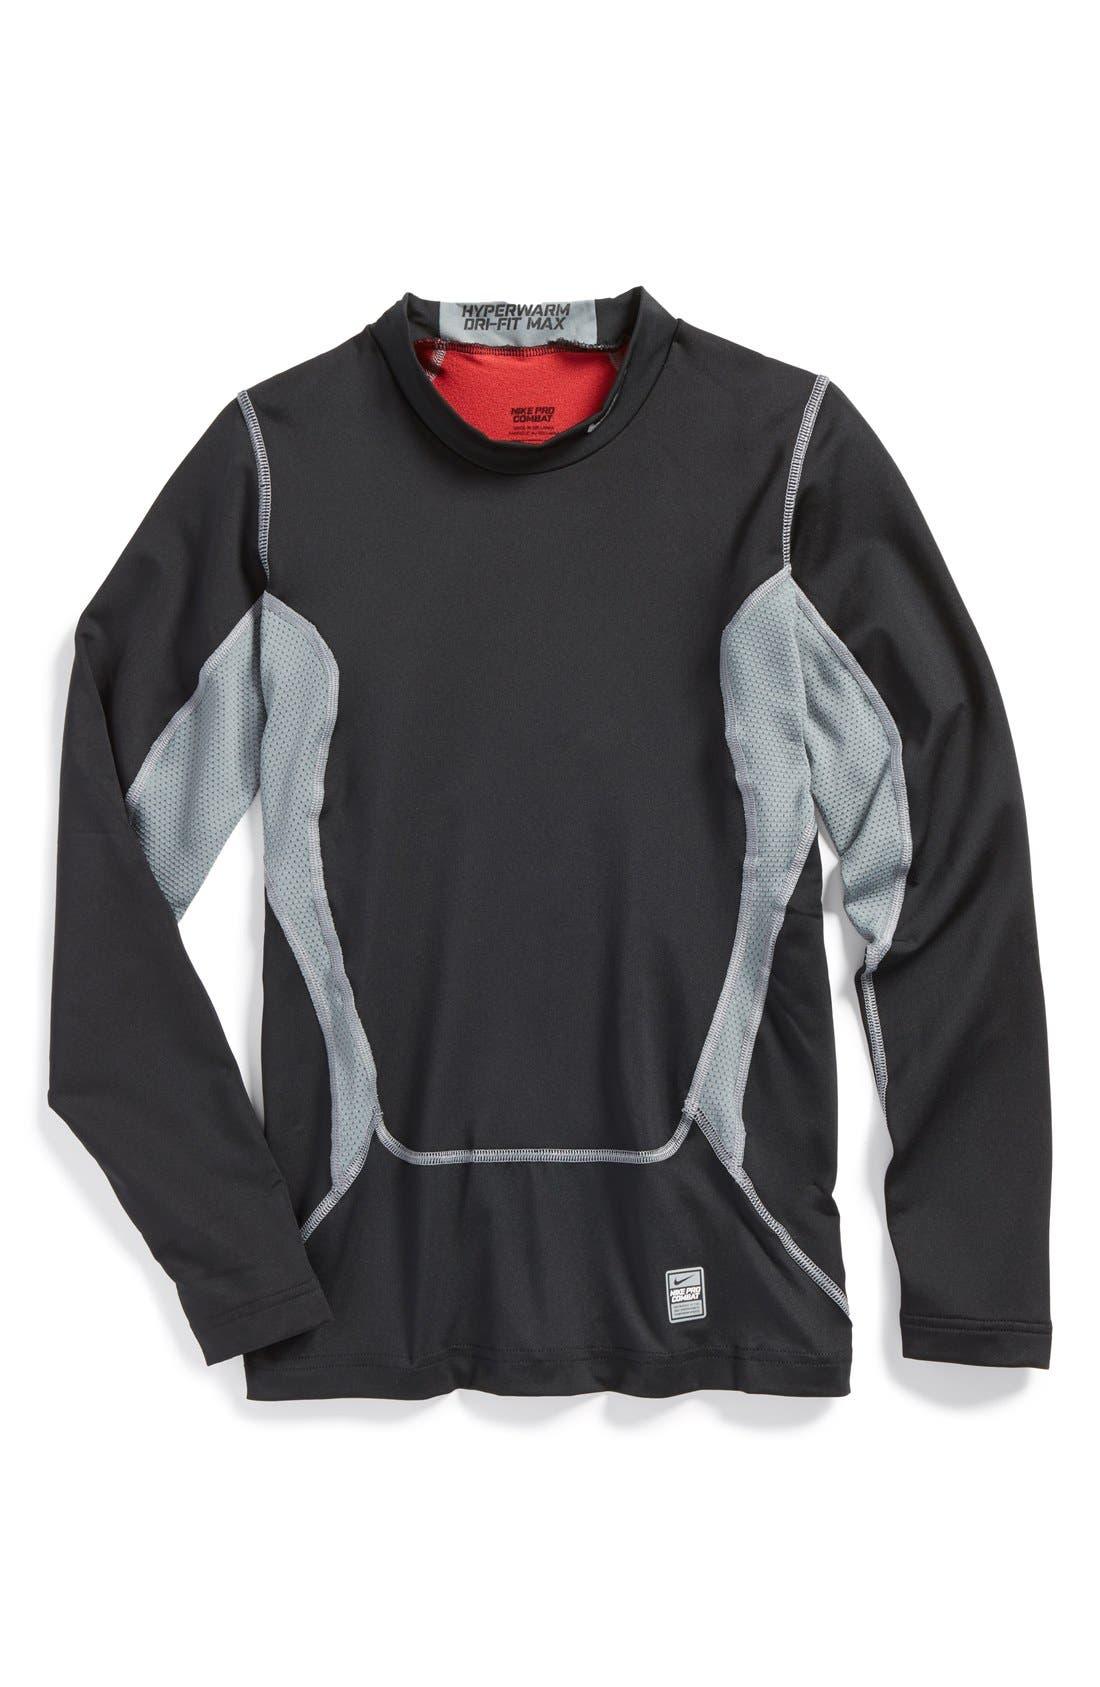 Main Image - Nike Compression Top (Big Boys)